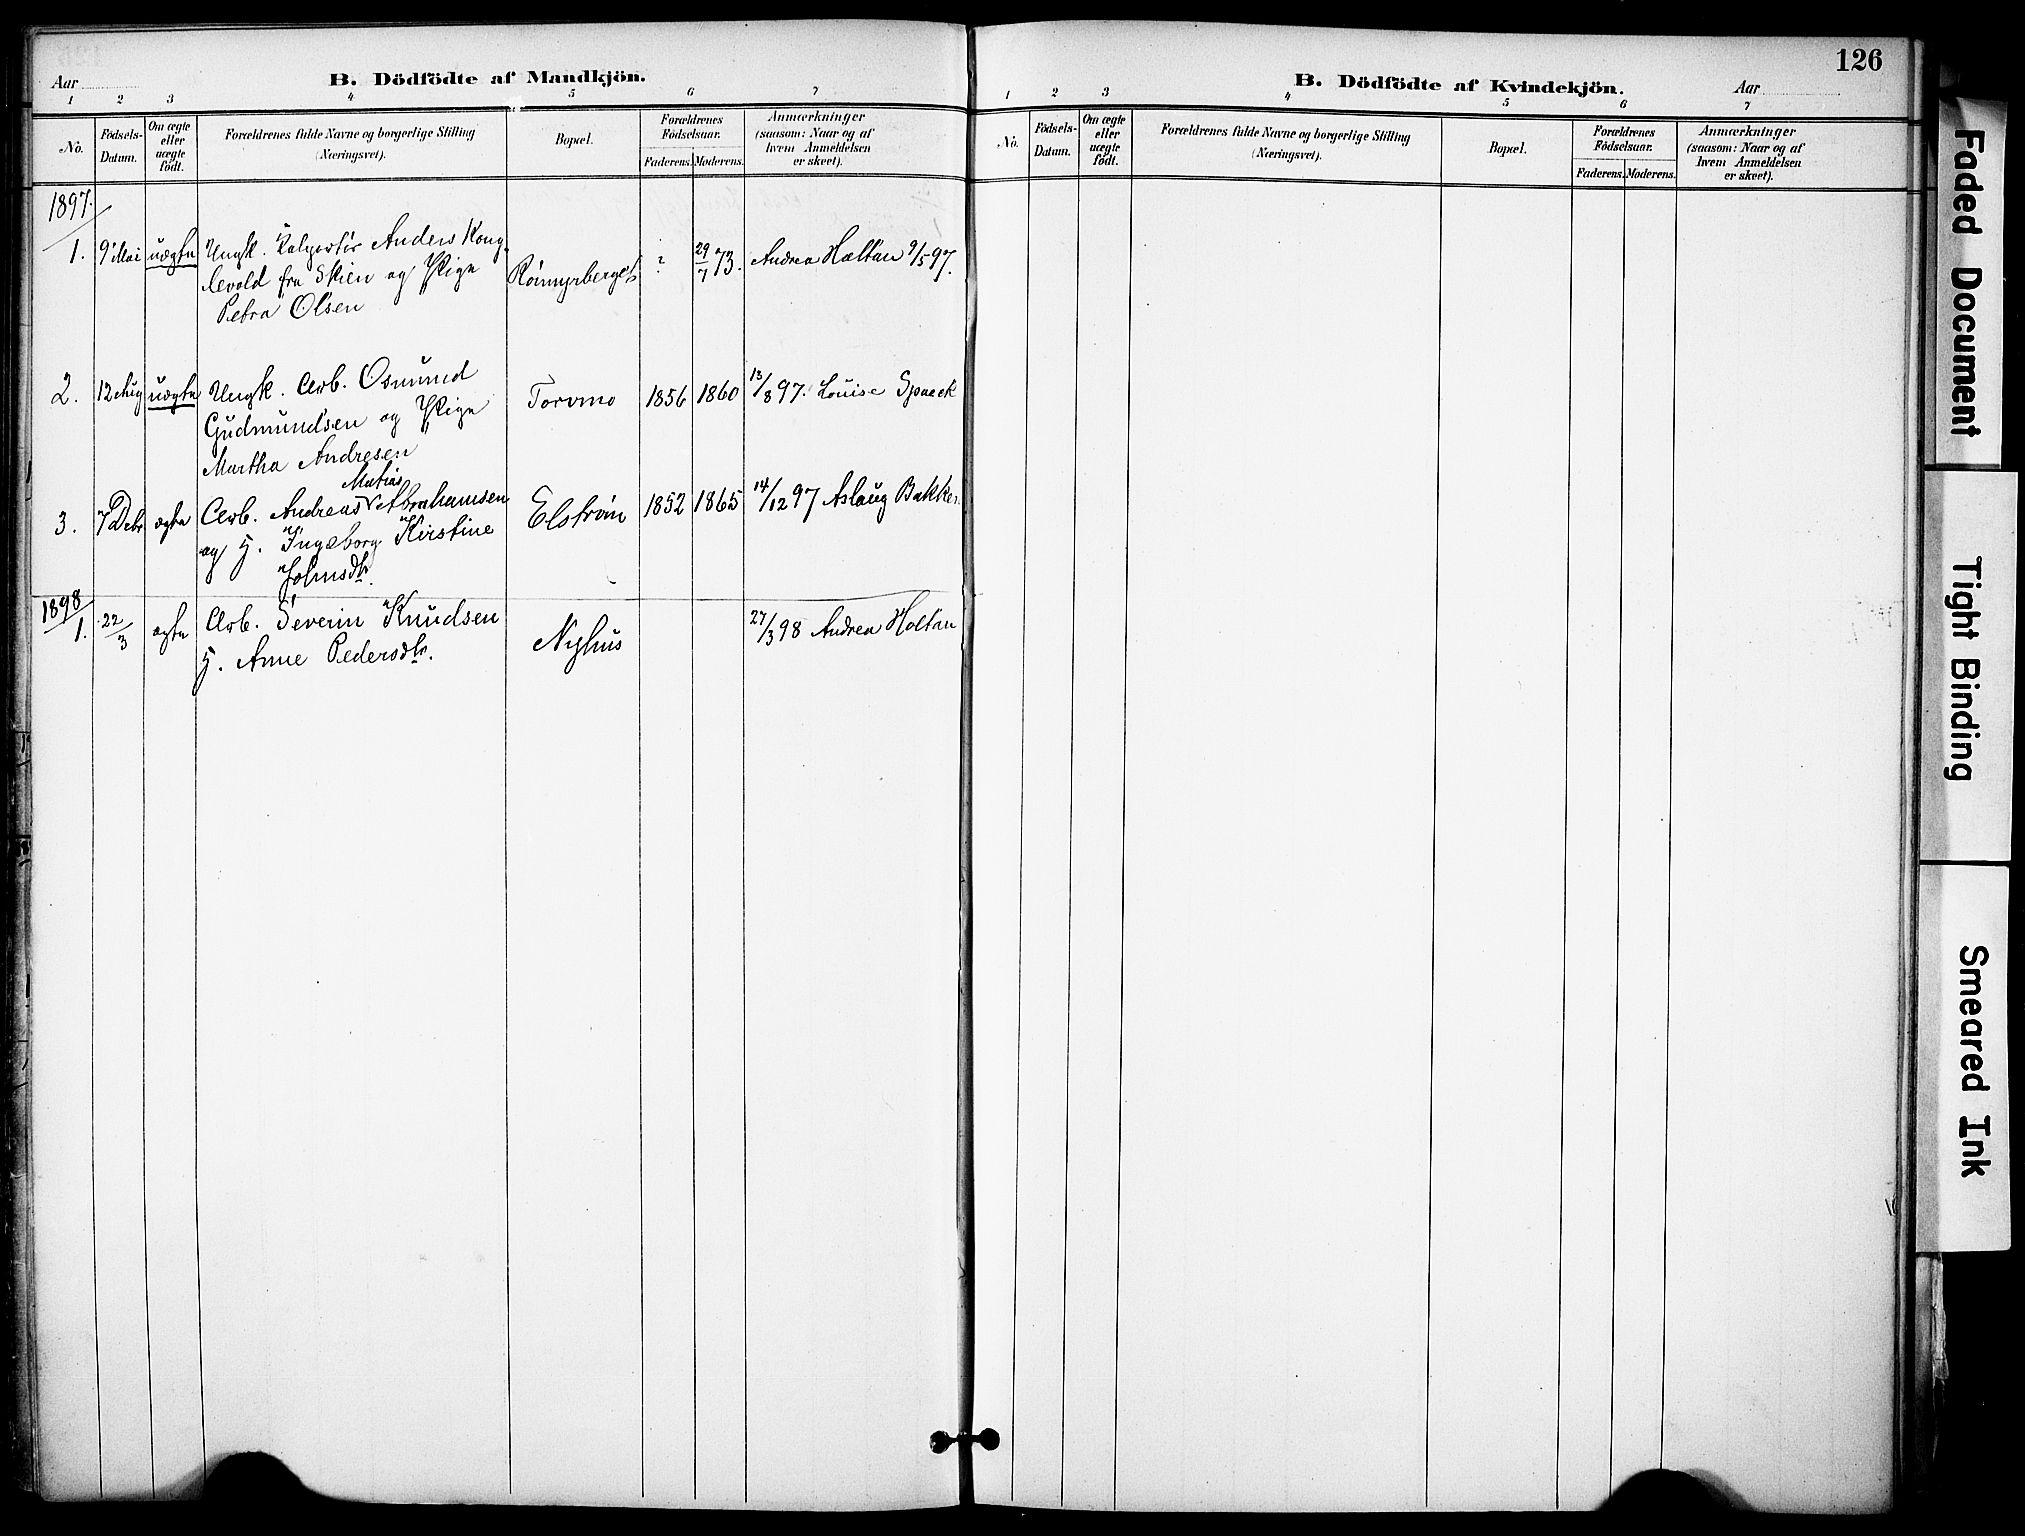 SAKO, Solum kirkebøker, F/Fa/L0010: Ministerialbok nr. I 10, 1888-1898, s. 126